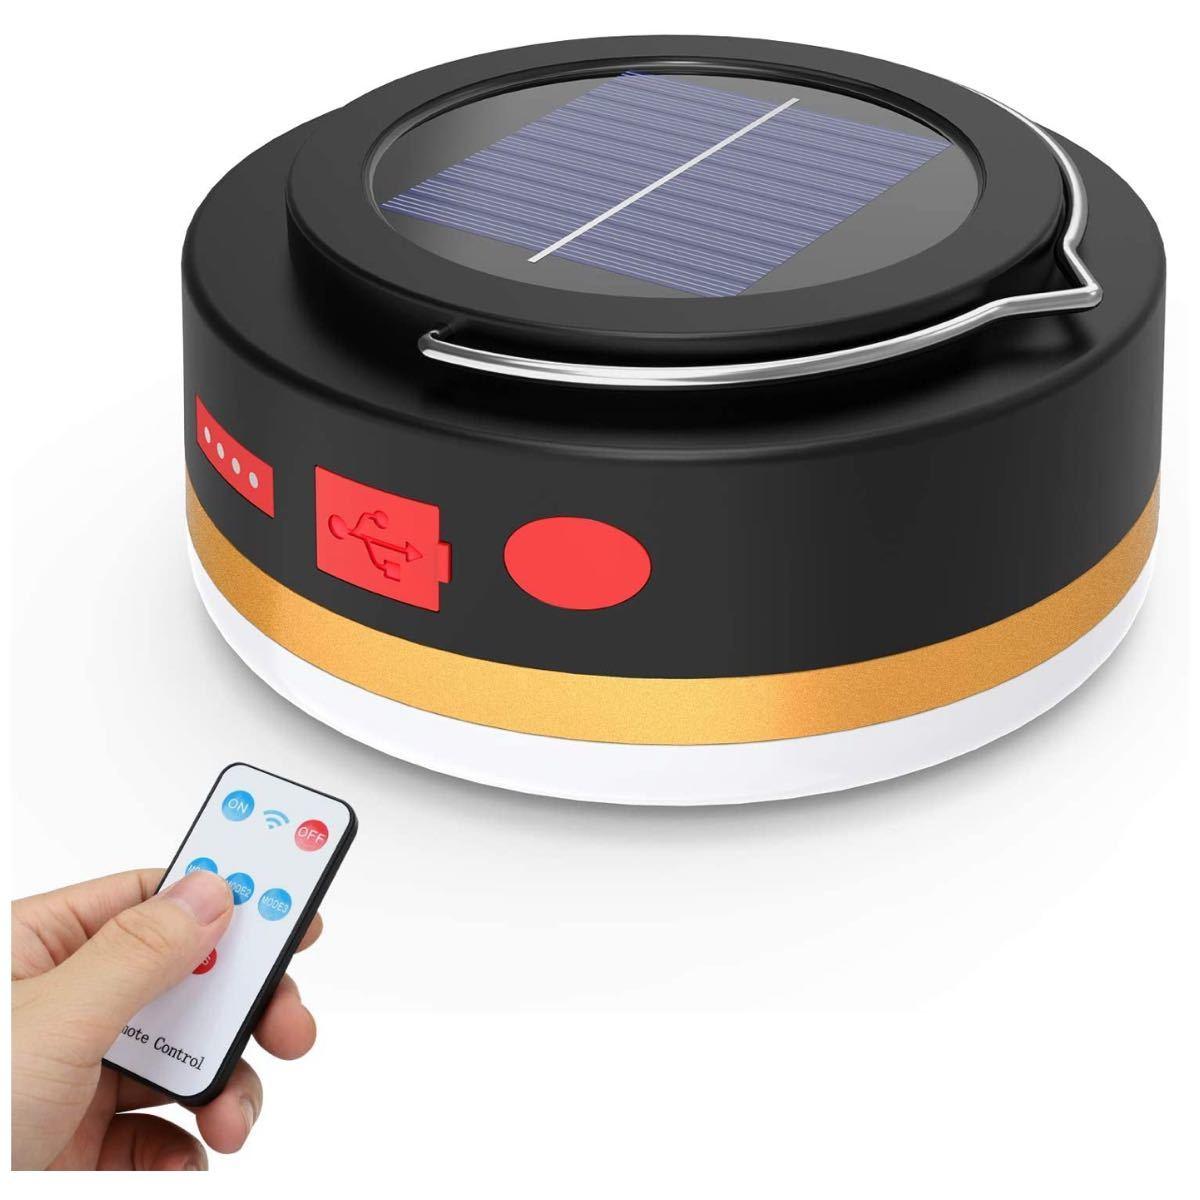 LEDランタン 高輝度 キャンプランタン 5つ点灯モード usb充電式 ソーラー充電